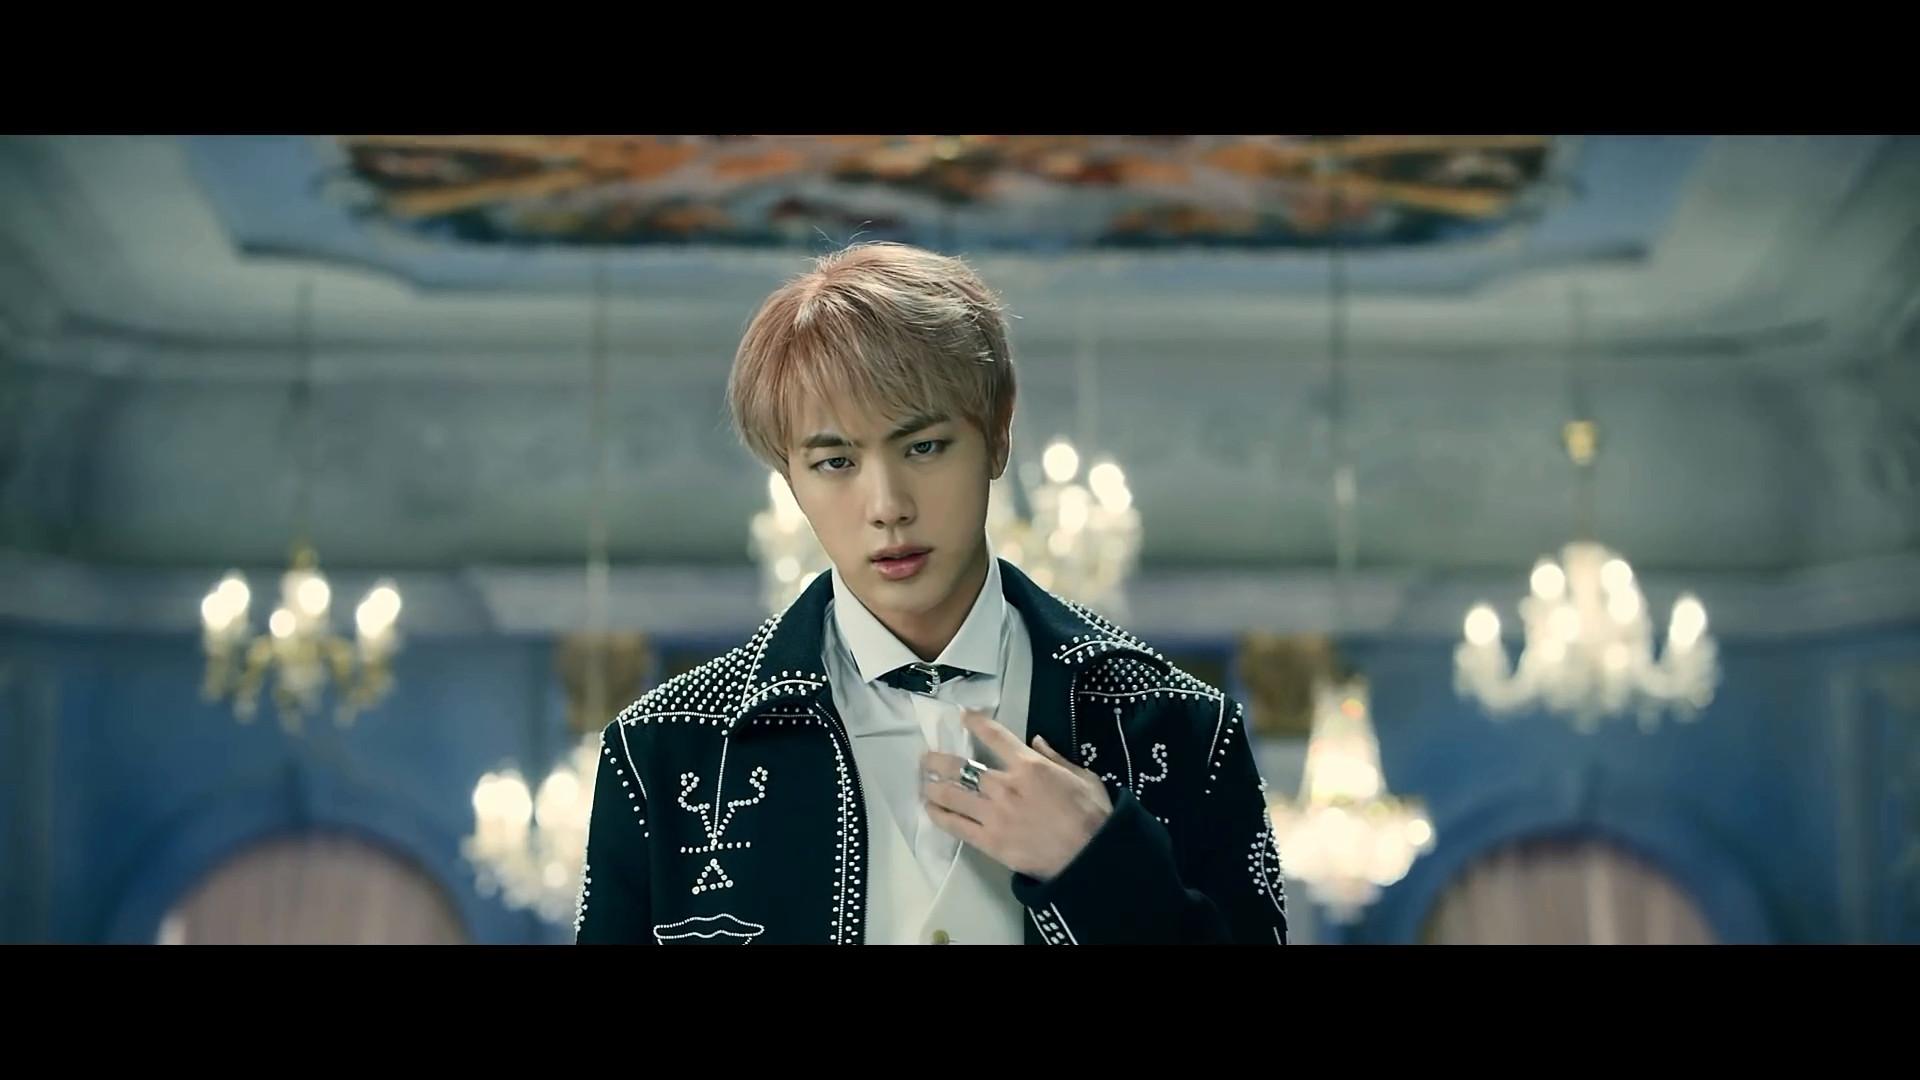 Korea Korean Kpop Idol Boy Band Group BTS Blood Sweat